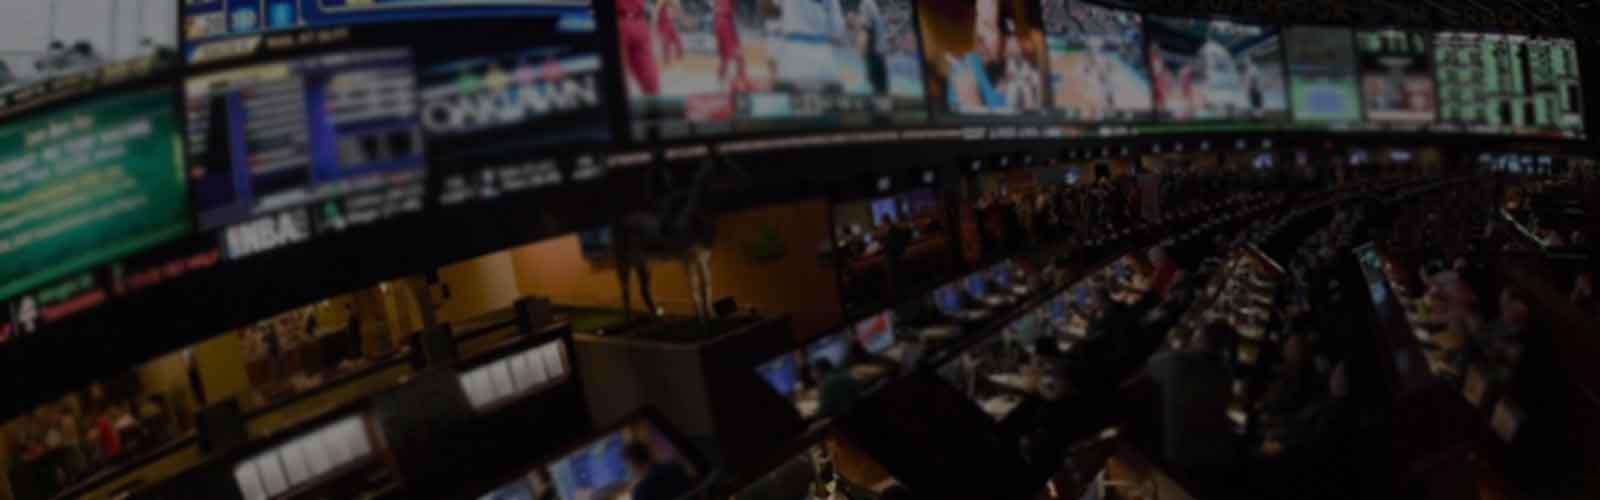 custom sports betting software development